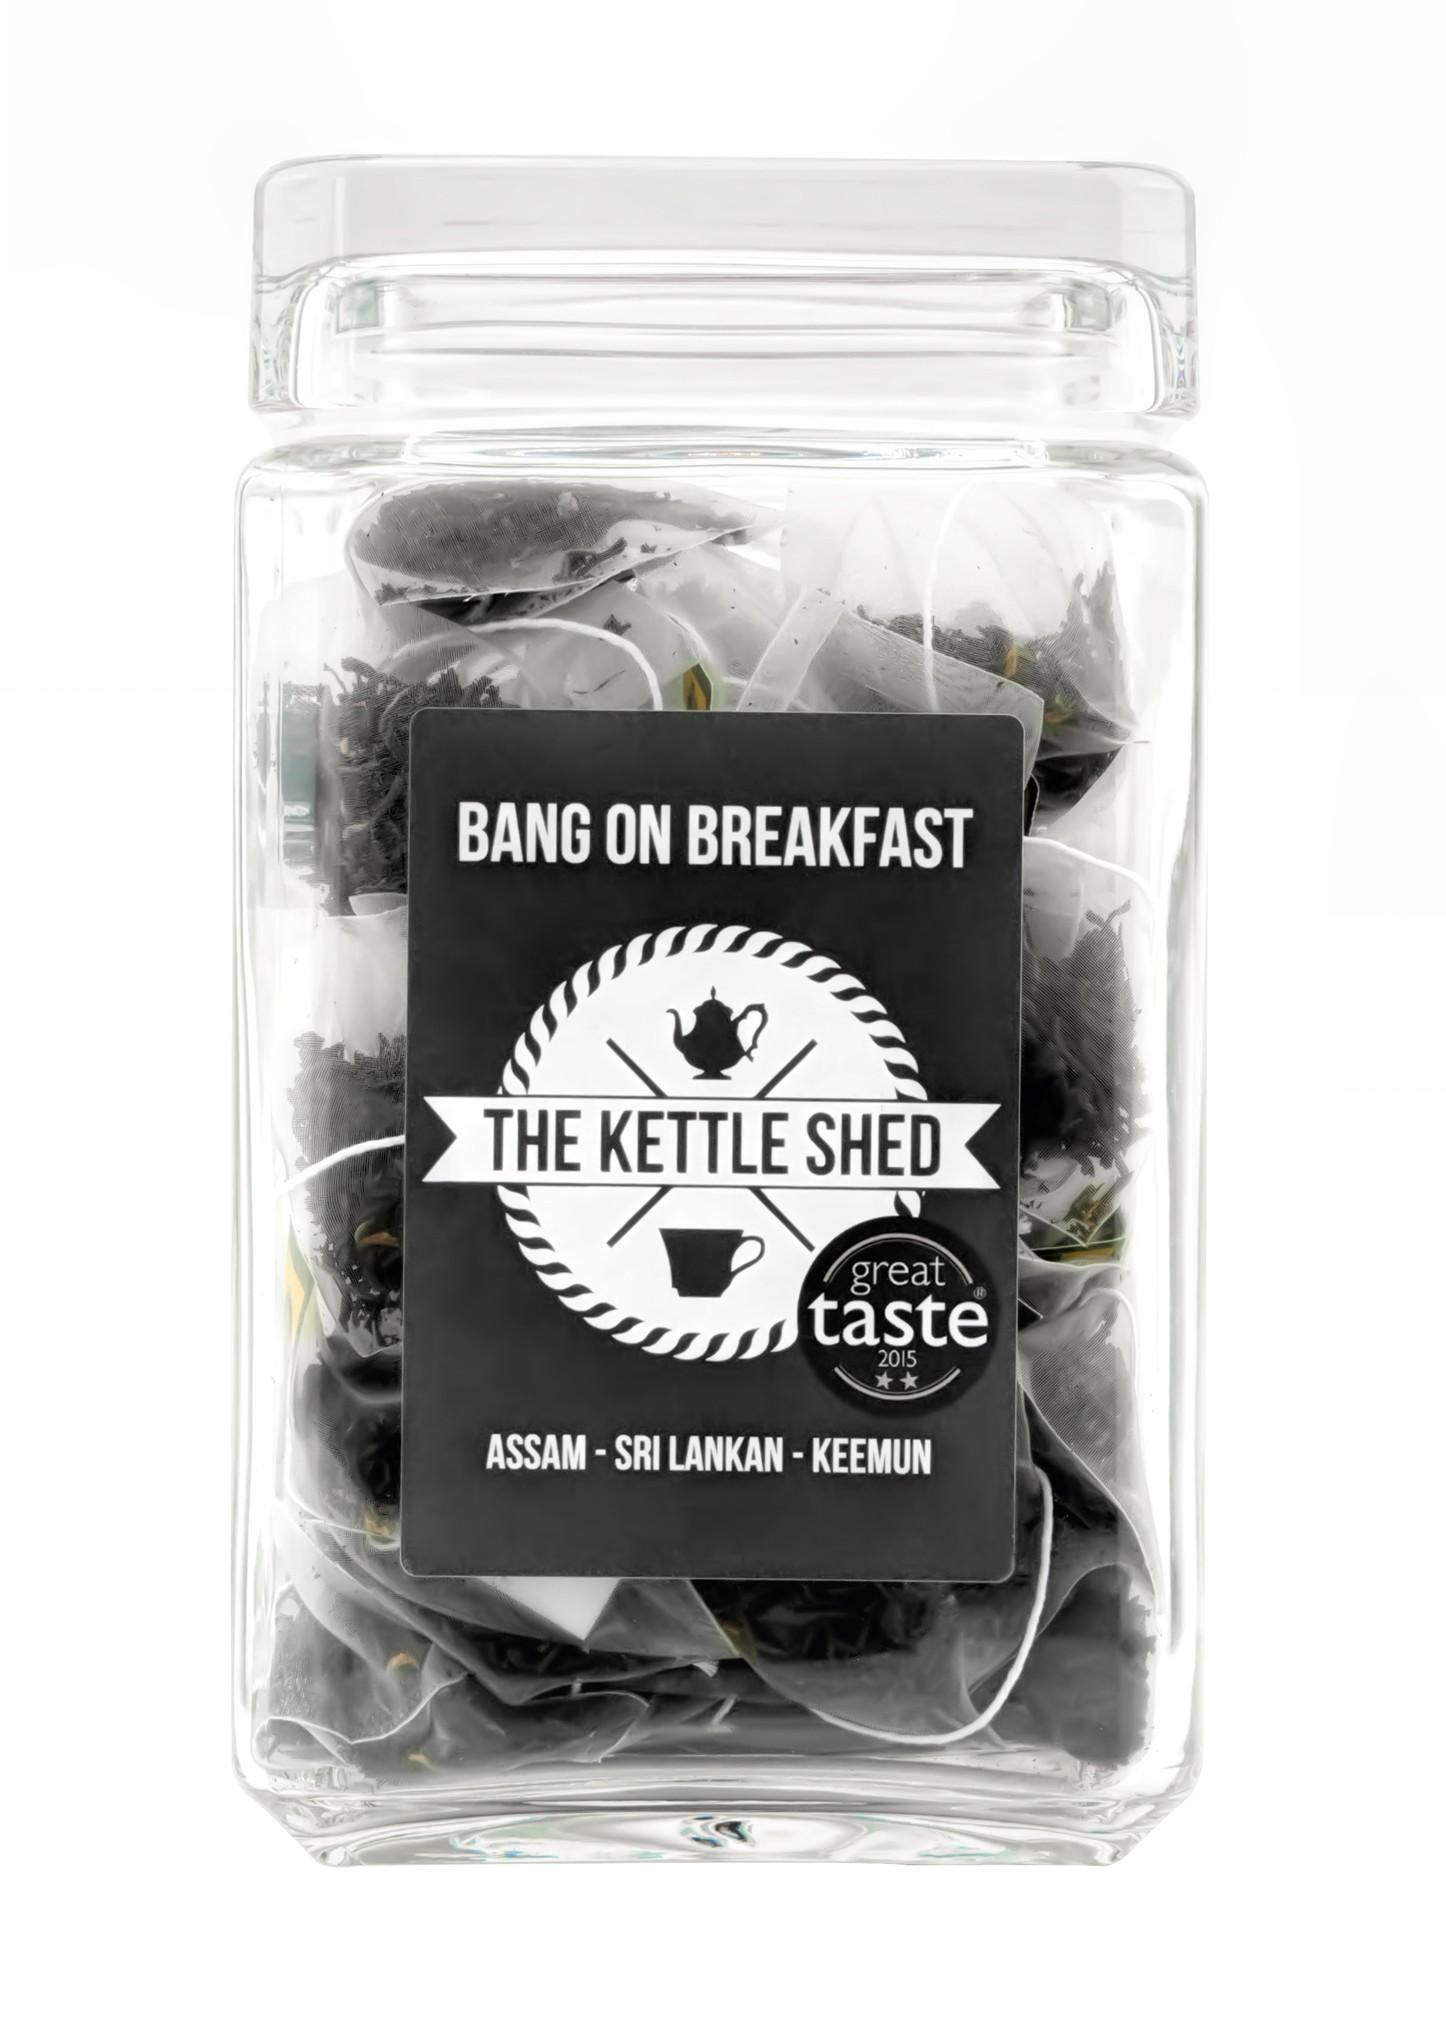 Bang on Breakfast - Glass Display Jar (without tea)